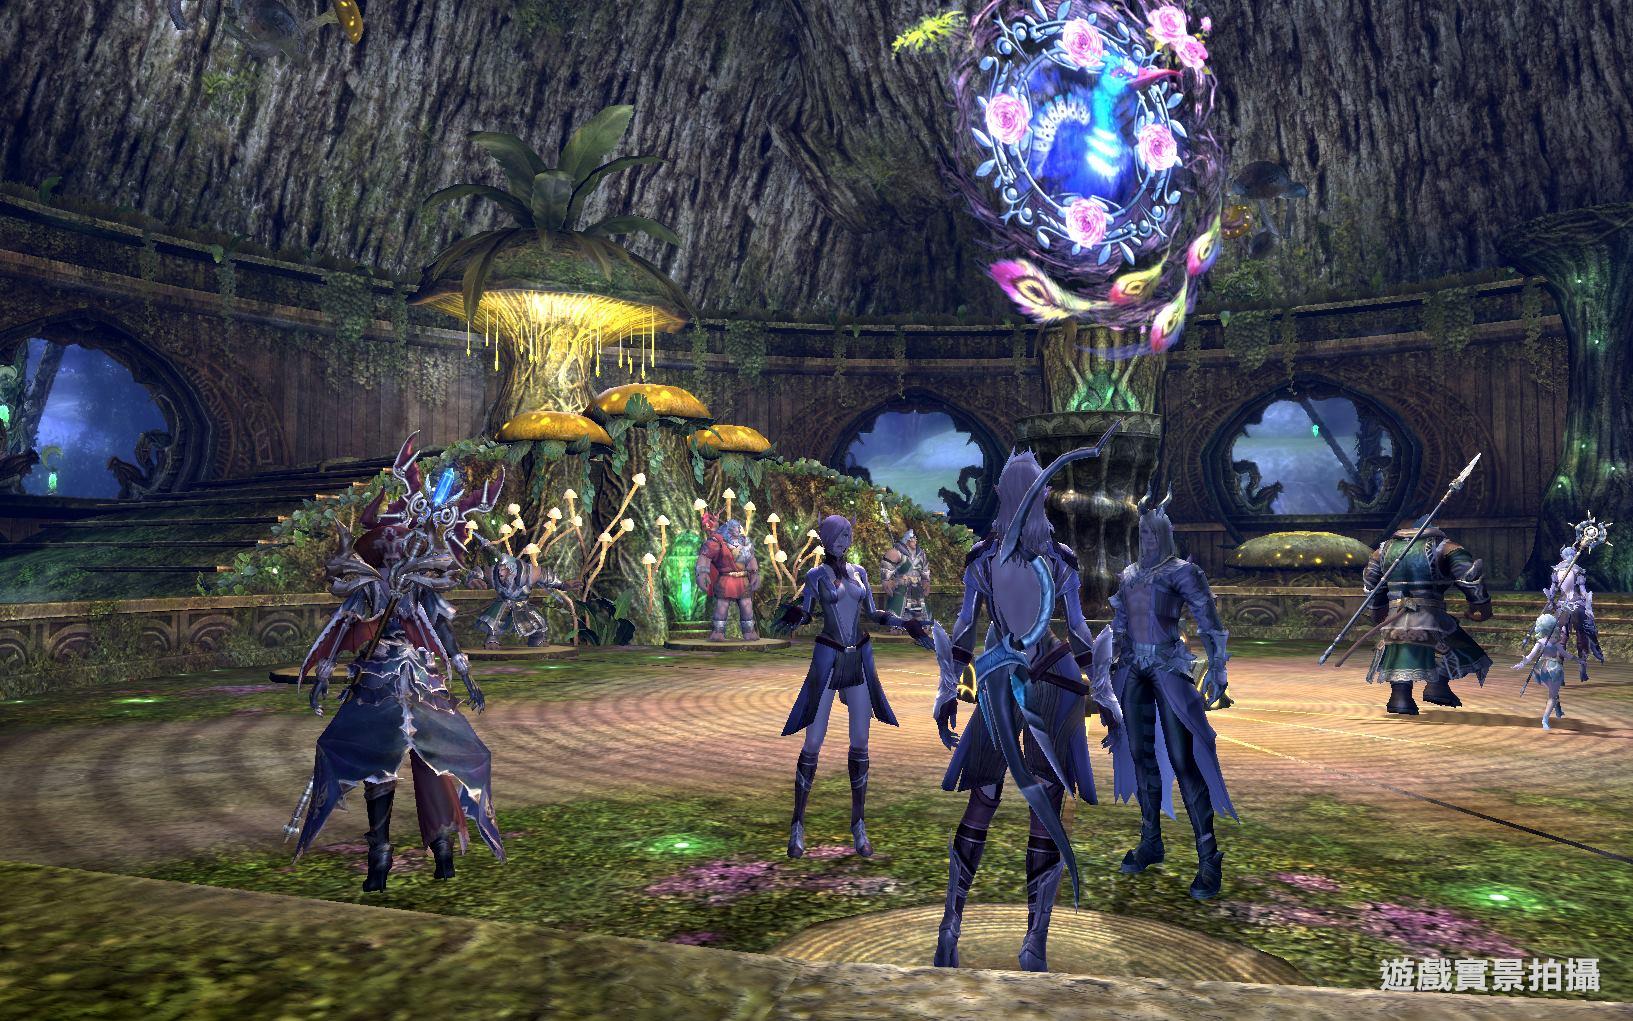 The Age of Heroes screenshot 1